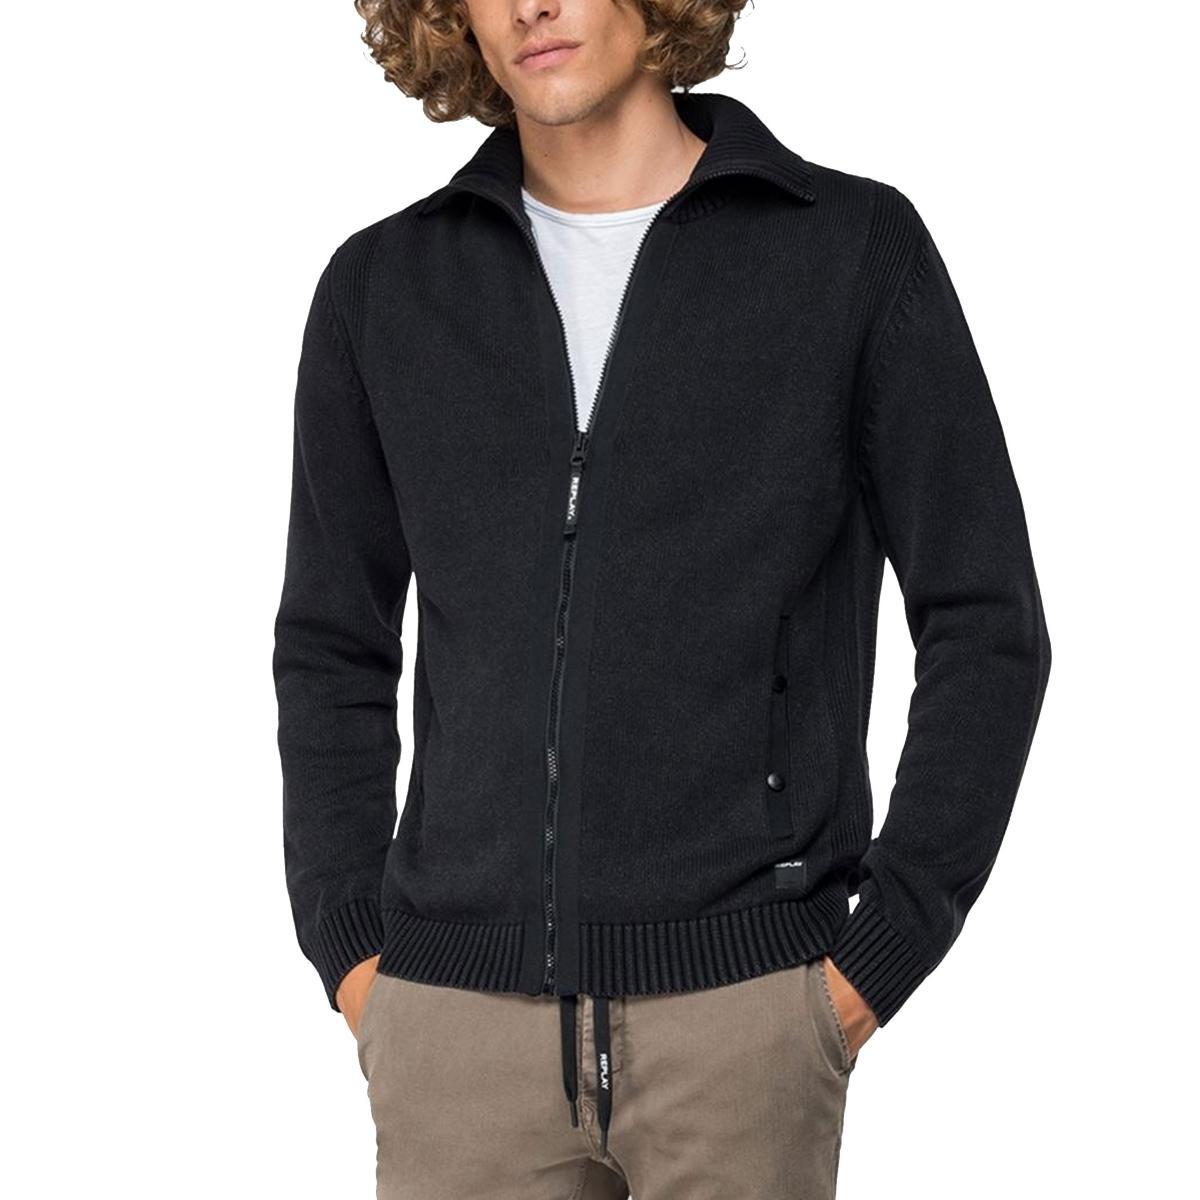 Cardigan felpa Replay in puro cotone con zip da uomo rif. UK3052.000.G21280G